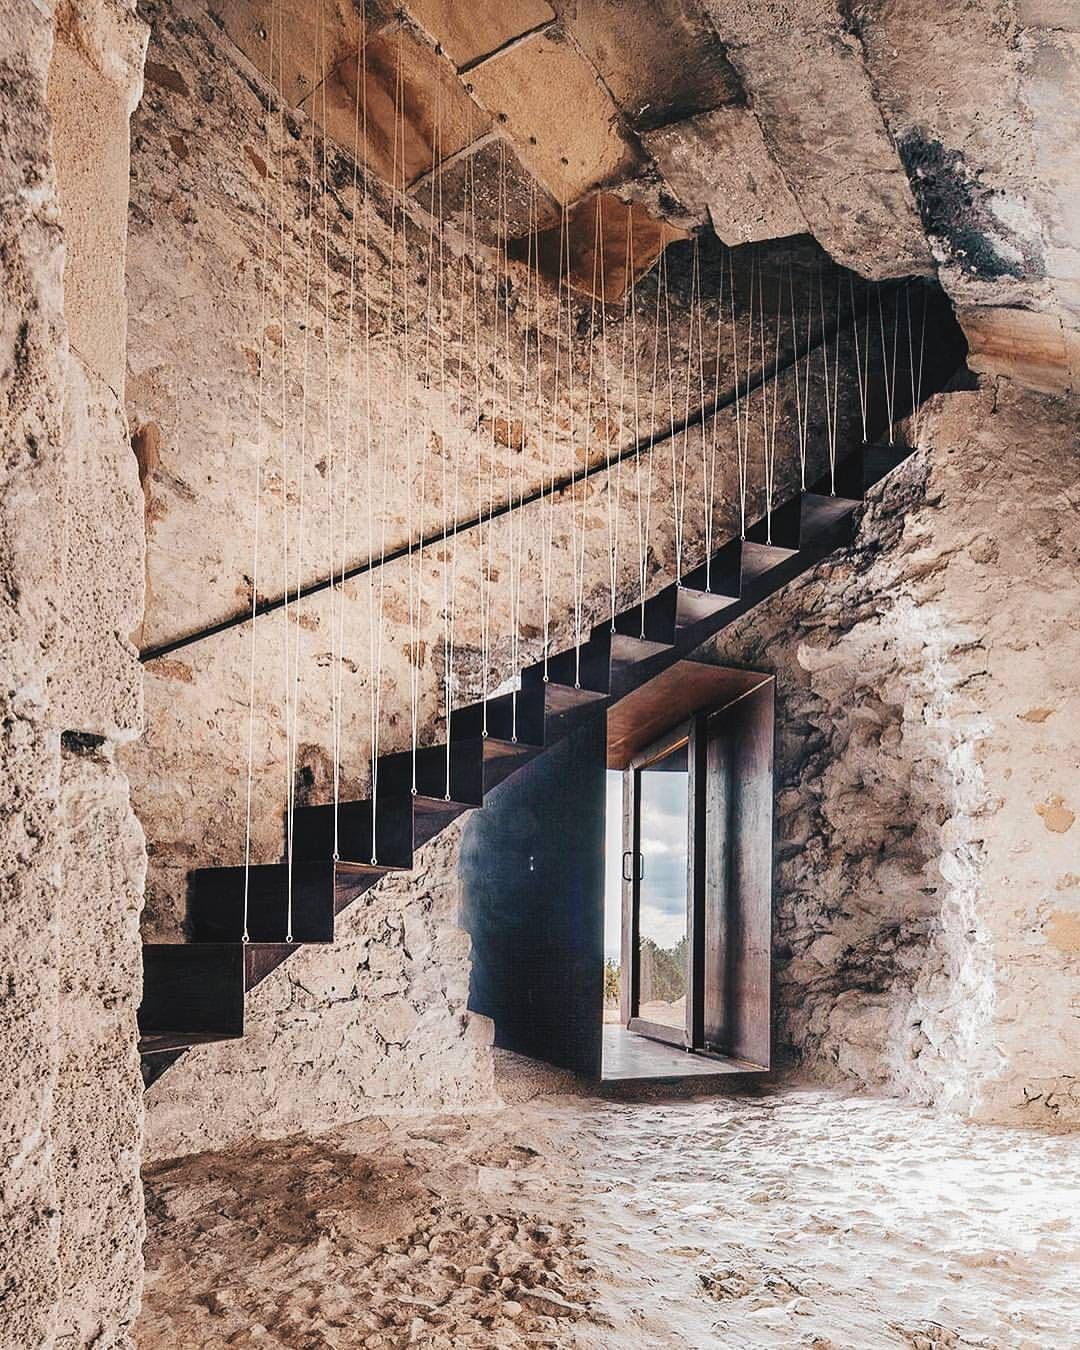 "6,661 Likes, 25 Comments - ALL OF ARCHITECTURE (@allofarchitecture) on Instagram: ""Such a cool place 🖤😋 #allofarchitecture Pi des Català tower by Marià Castelló Martínez via…"""